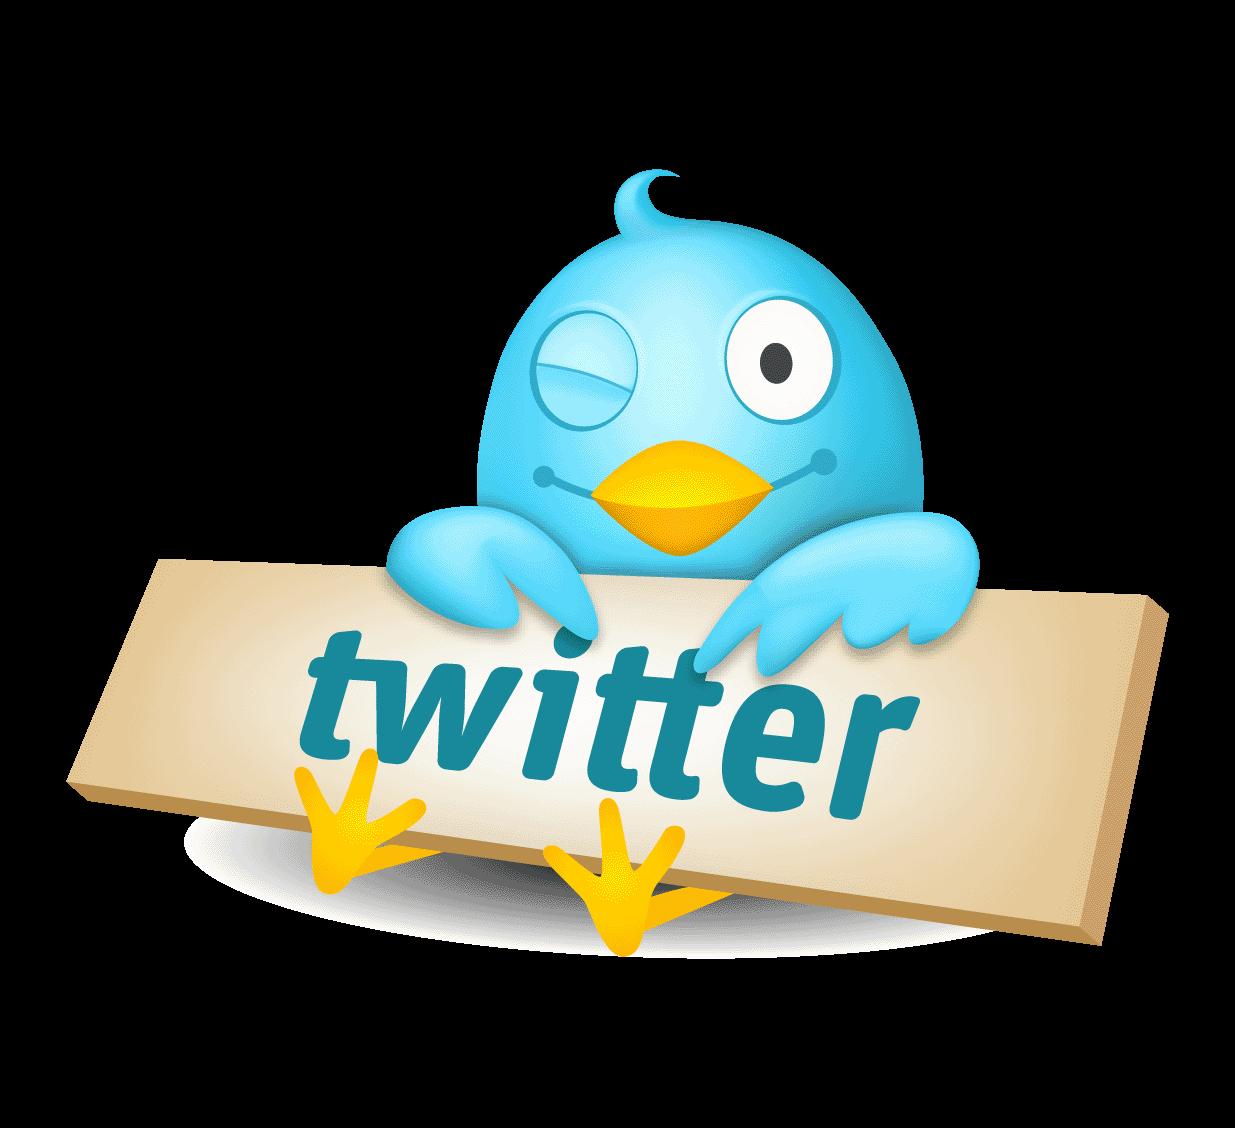 twitter-logo-bird-1 The Most Popular 15 Social Websites in The World